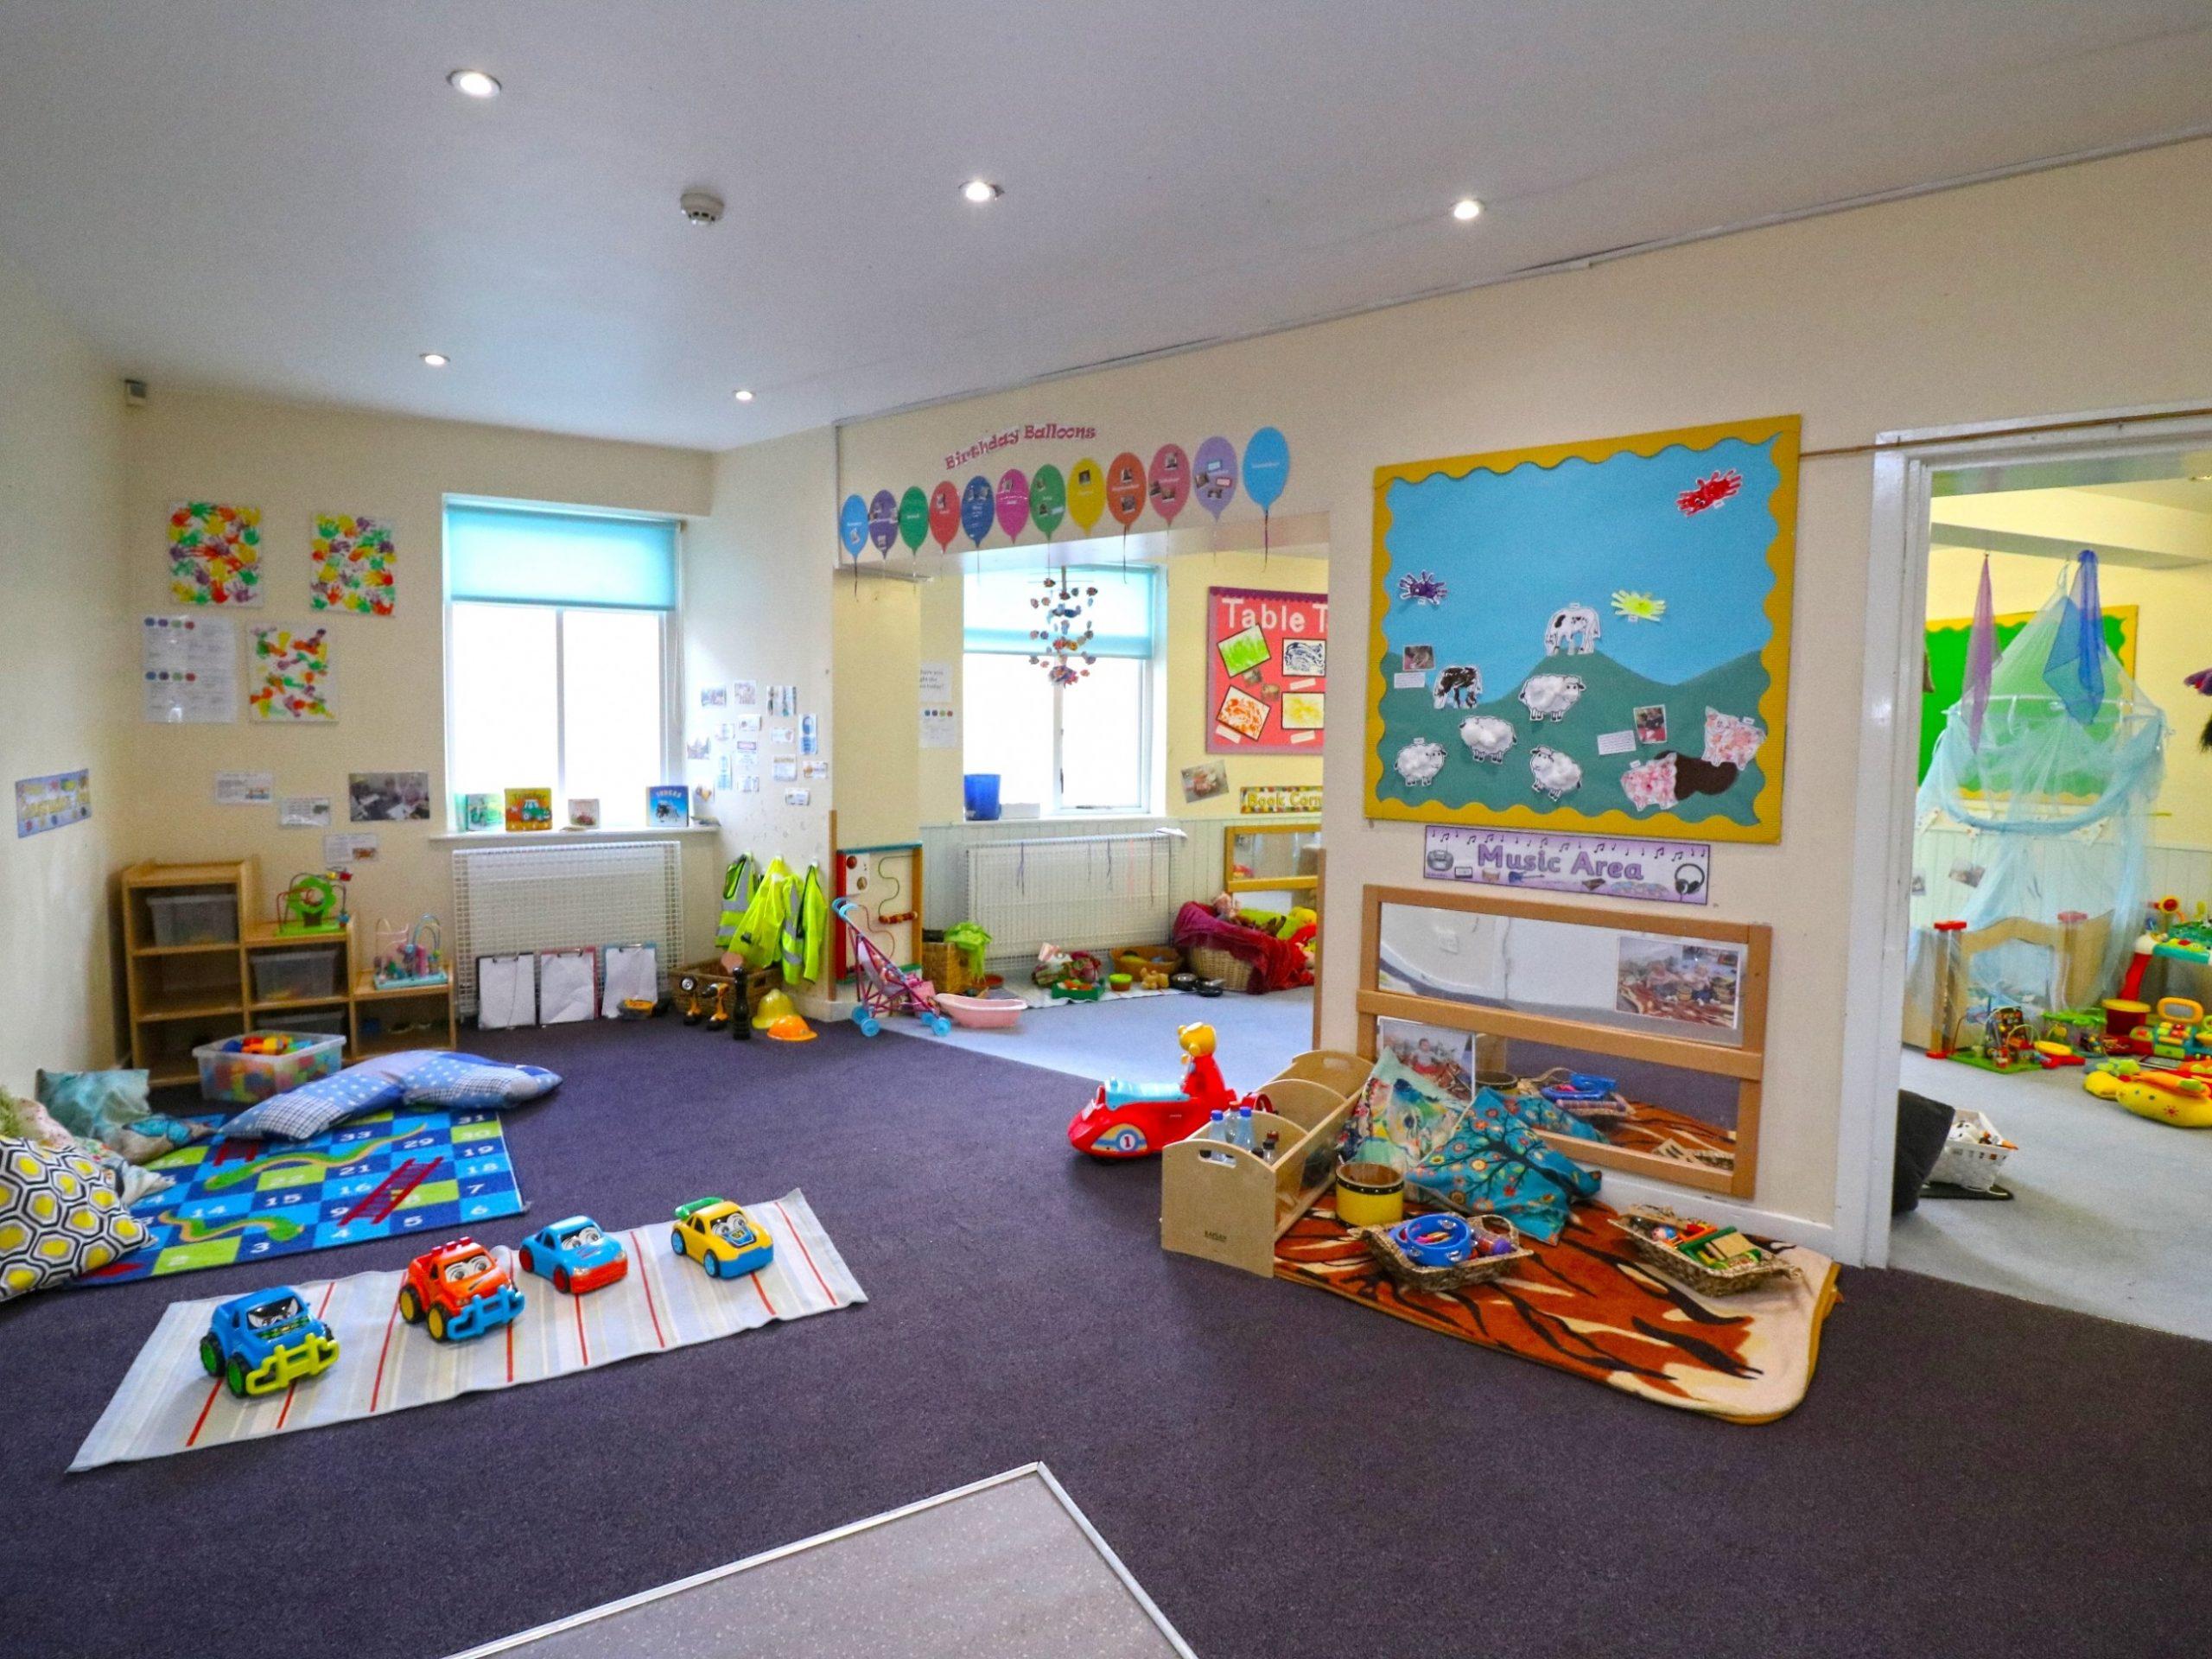 Cornfields Day Nursery  Baby Room - Baby Room Job Vacancies